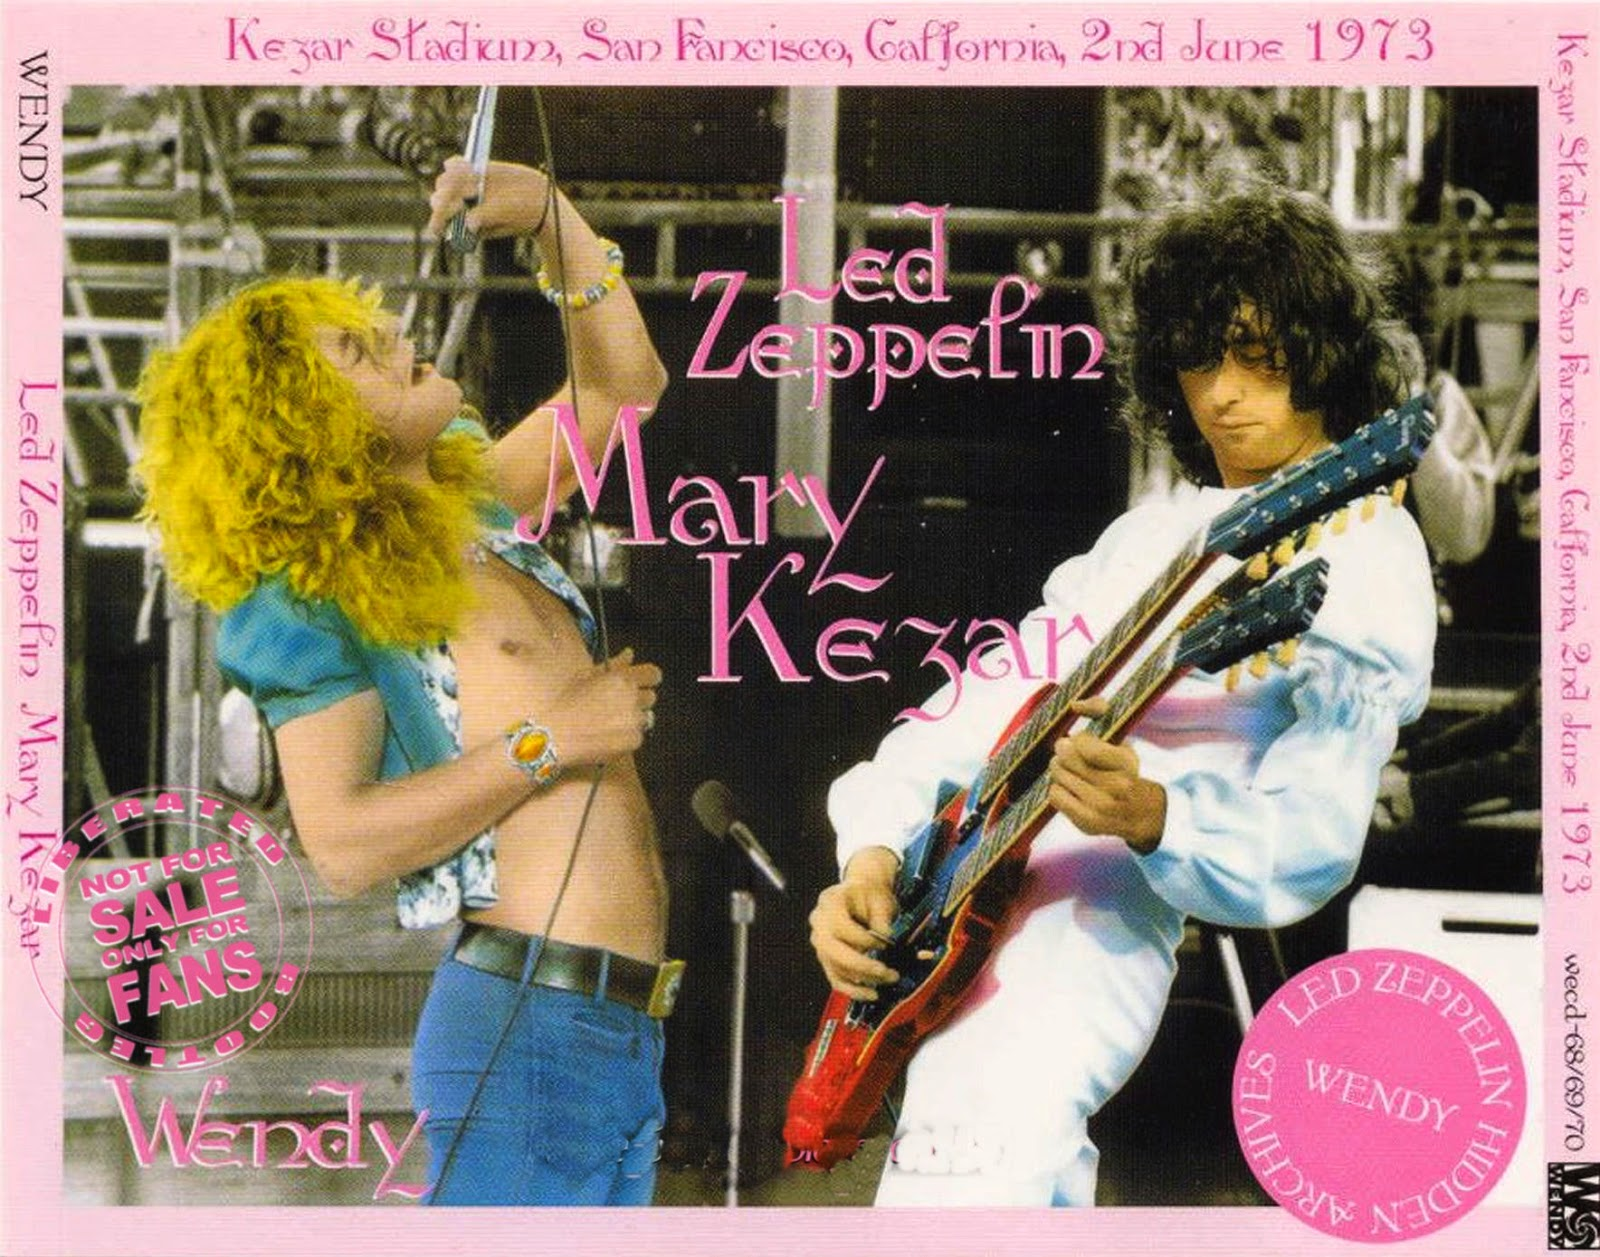 1973 - Led Zeppelin - Mary Kezar - San Francisco - Bootleg